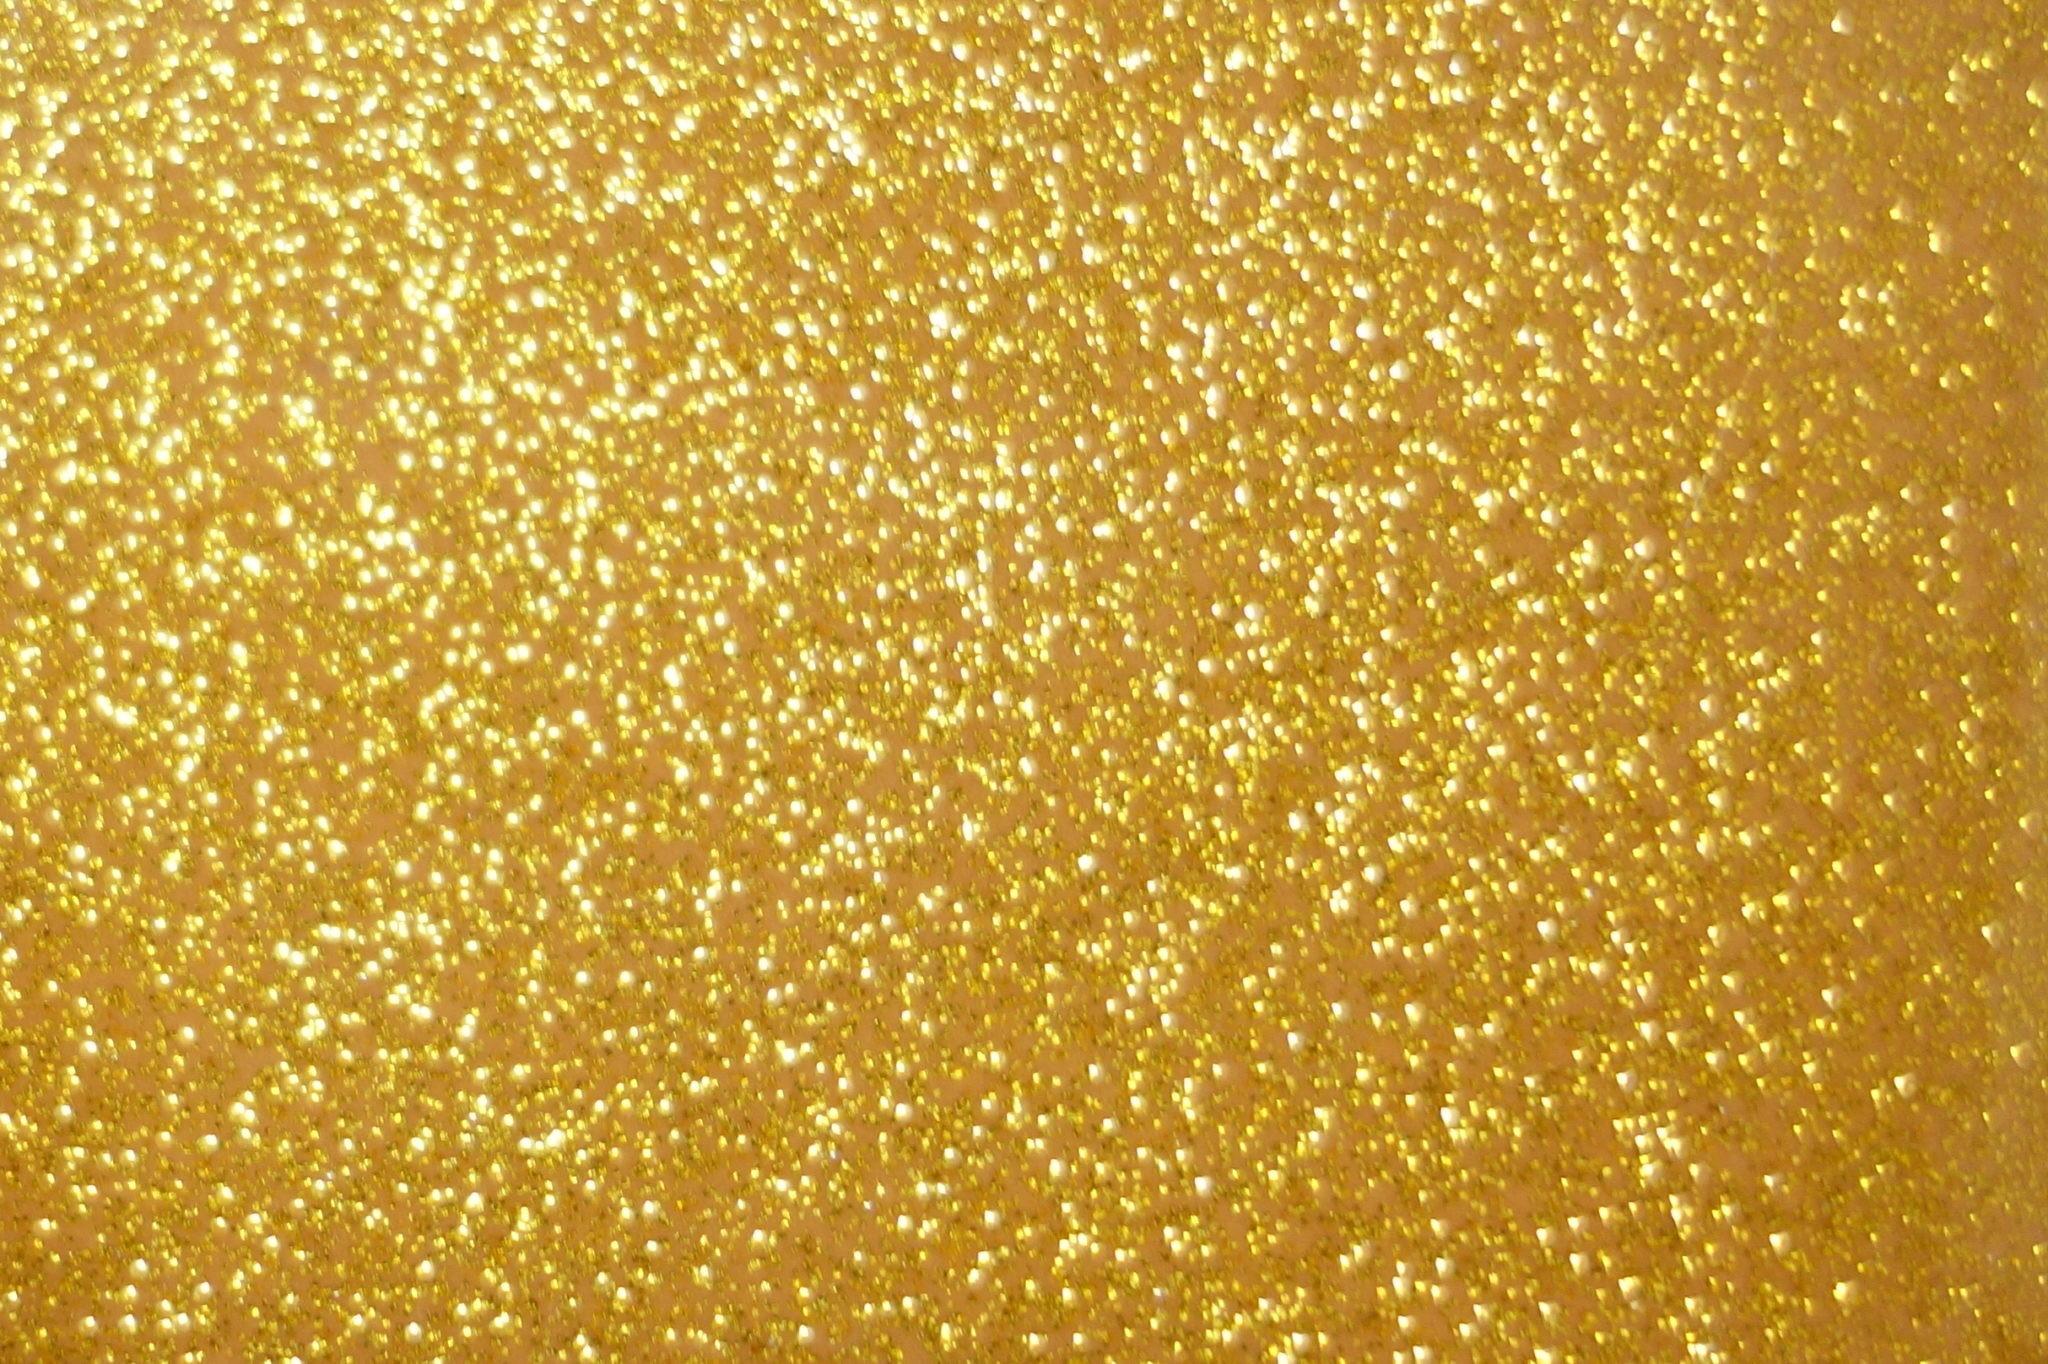 Gold Glitter Wallpapers